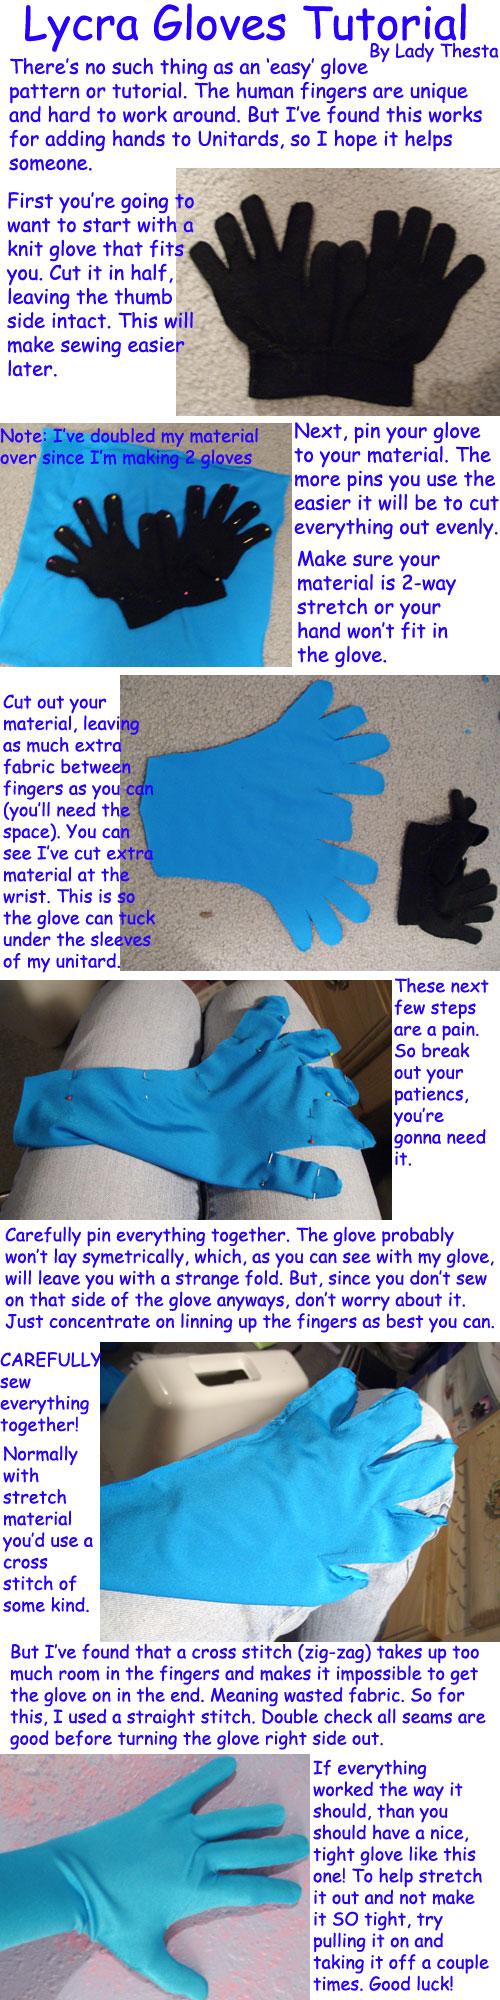 Lycra Glove Sewing Tutorial by ladythesta